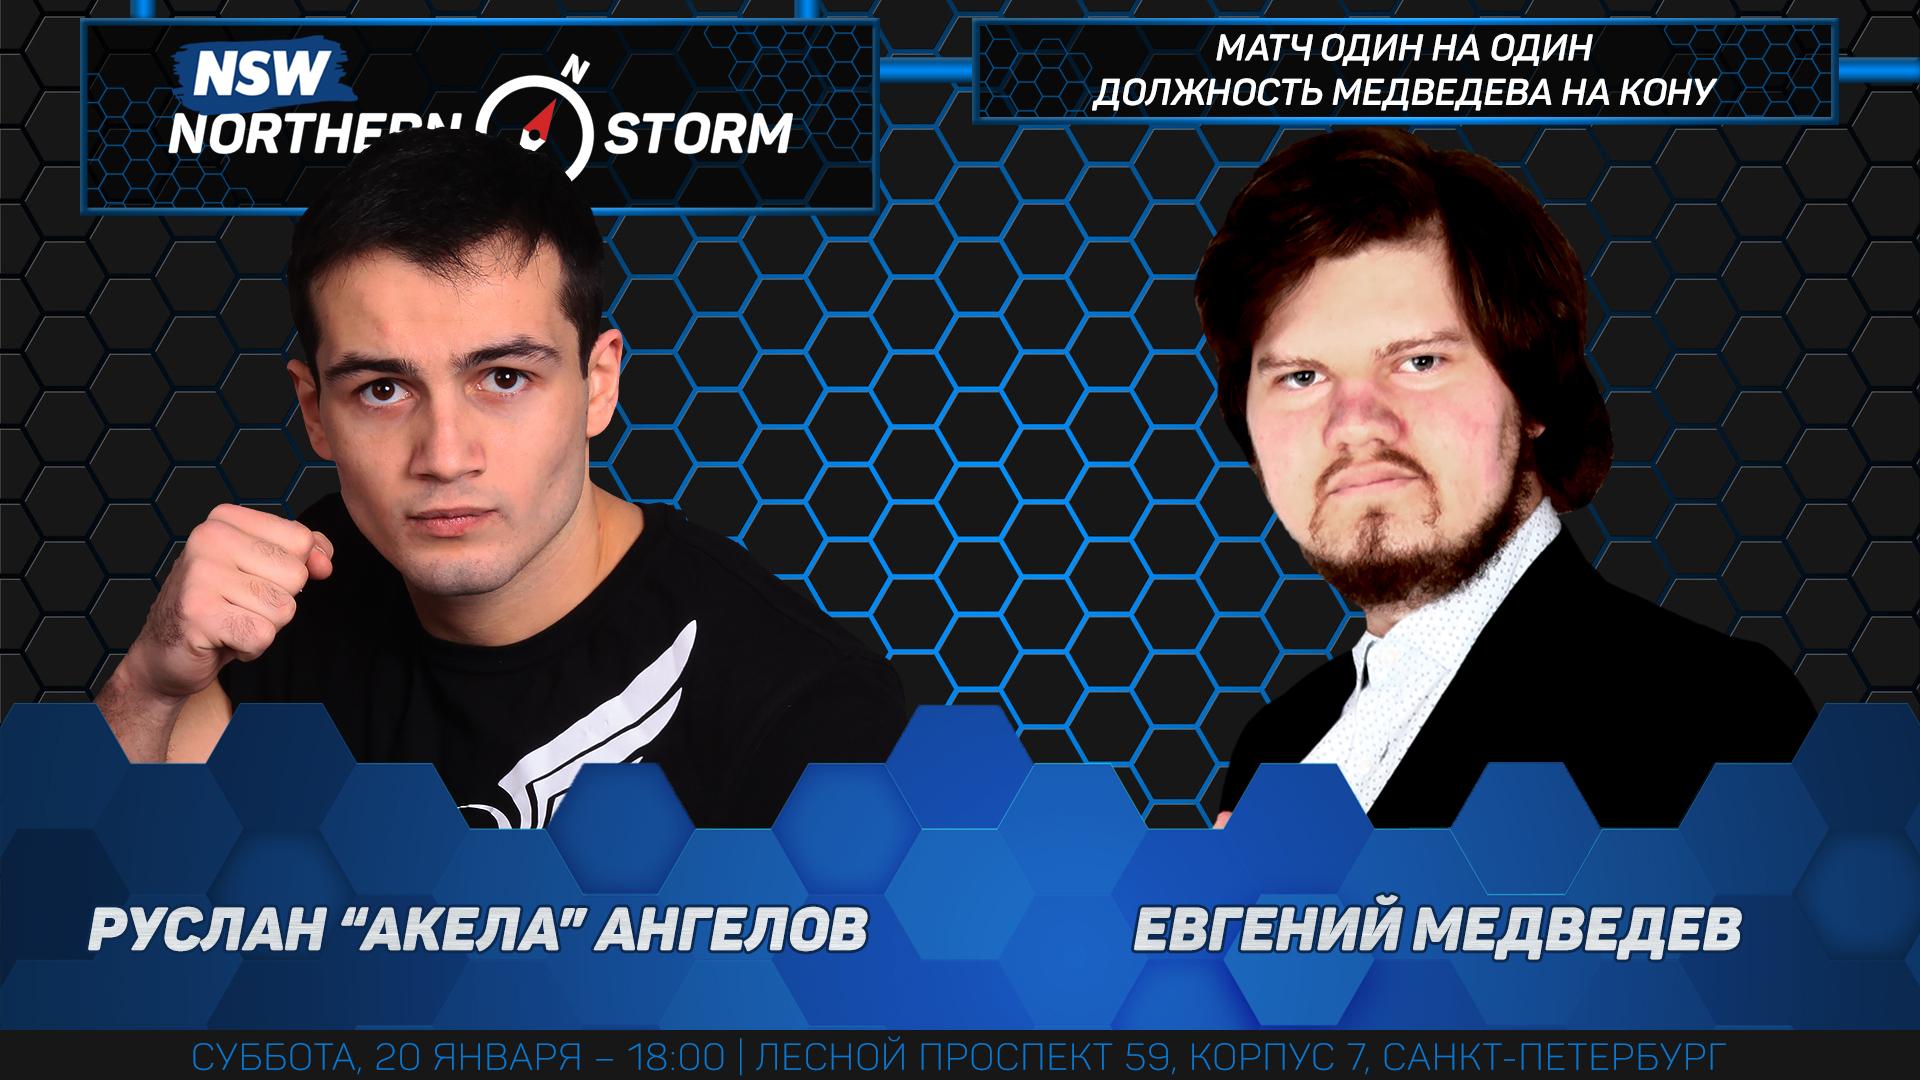 NSW Northern Storm (20/01): Руслан «Акела» Ангелов против Евгения Медведева